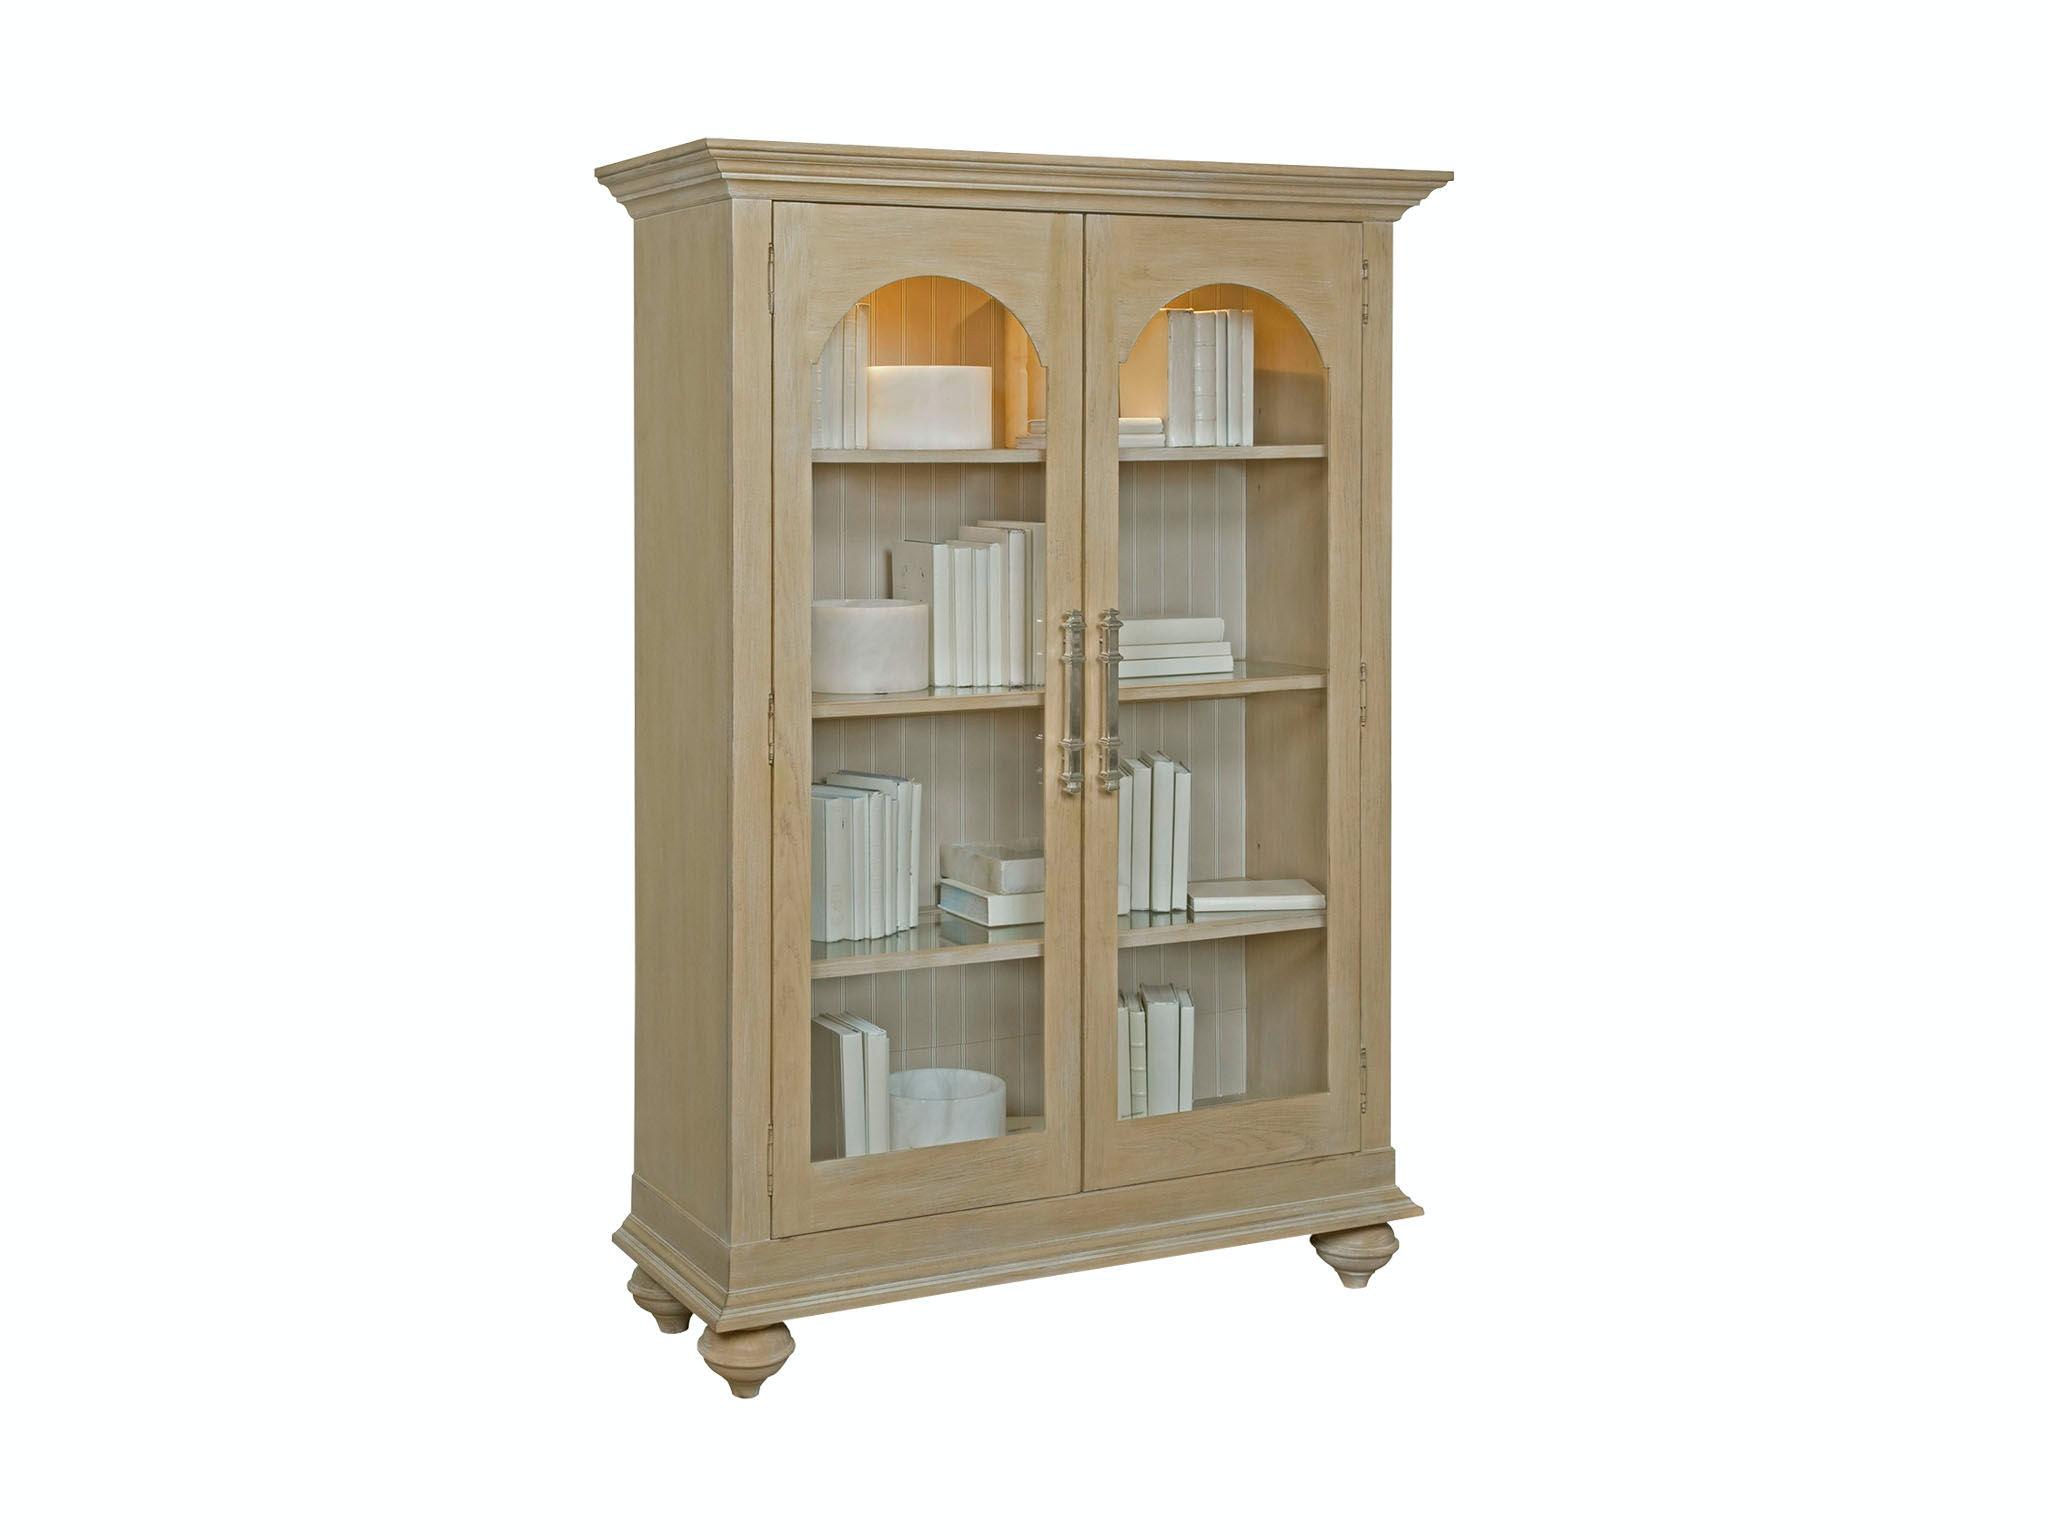 Drexel Plaudits Display Cabinet 175 550